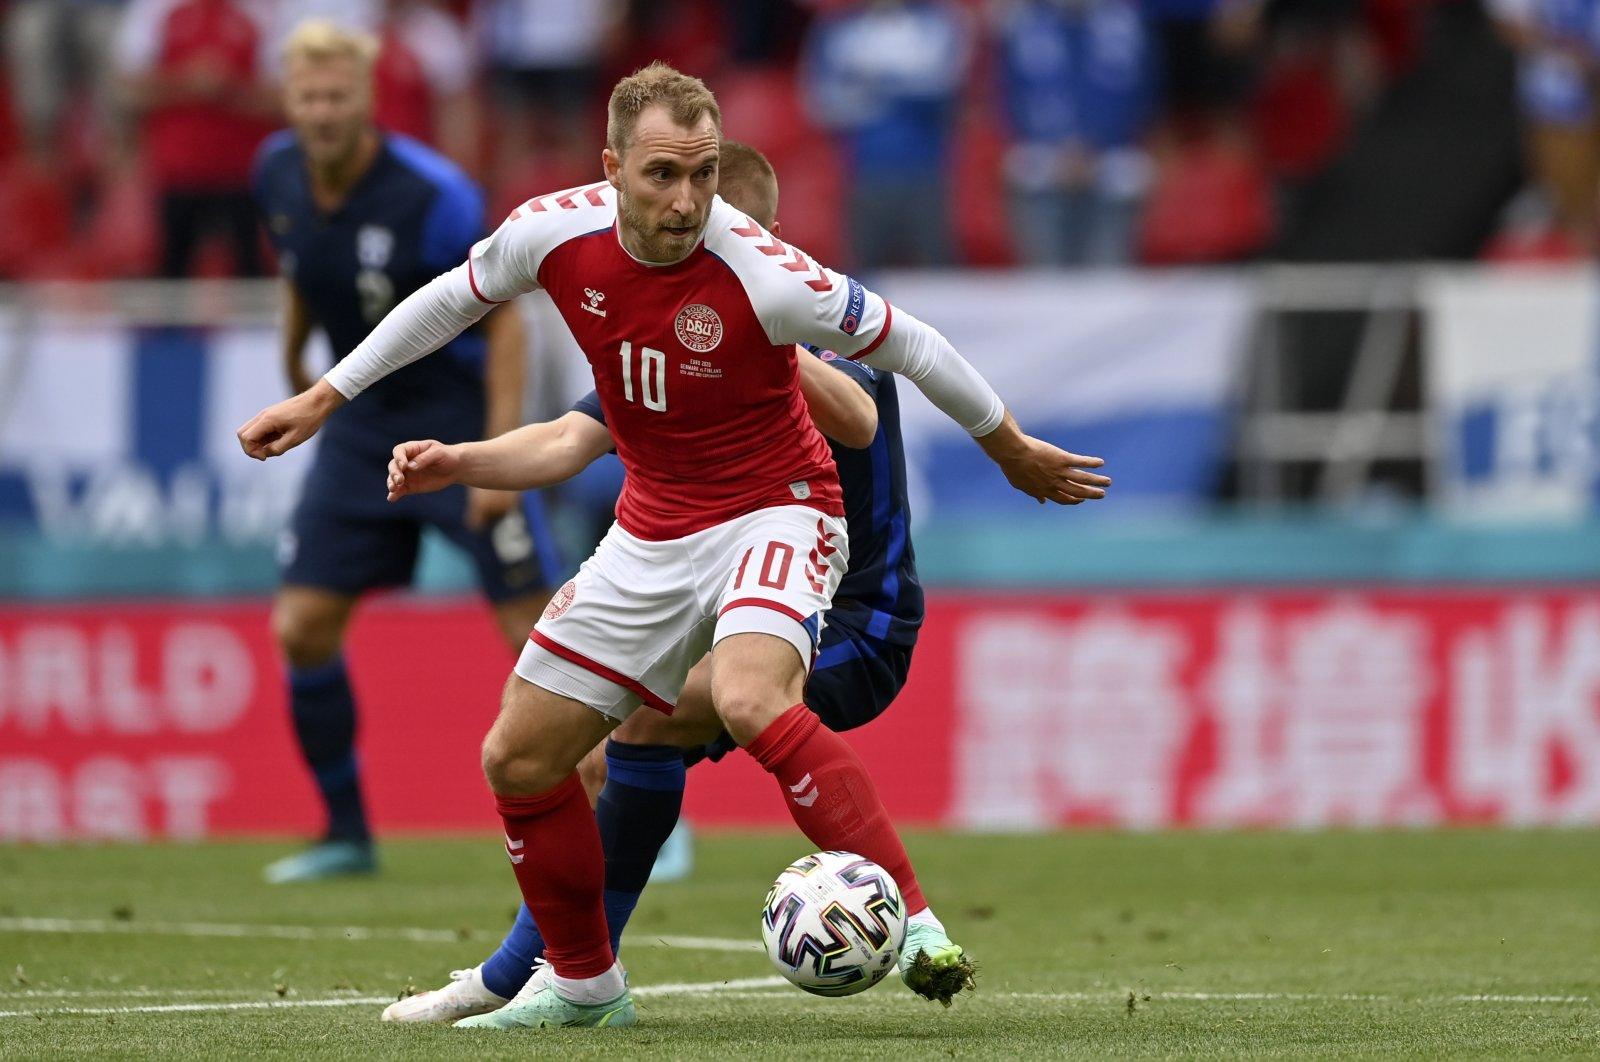 Denmark's Christian Eriksen controls the ball during a Euro 2020 match against Finland at Parken Stadium in Copenhagen, Denmark, June 12, 2021. (AP Photo)